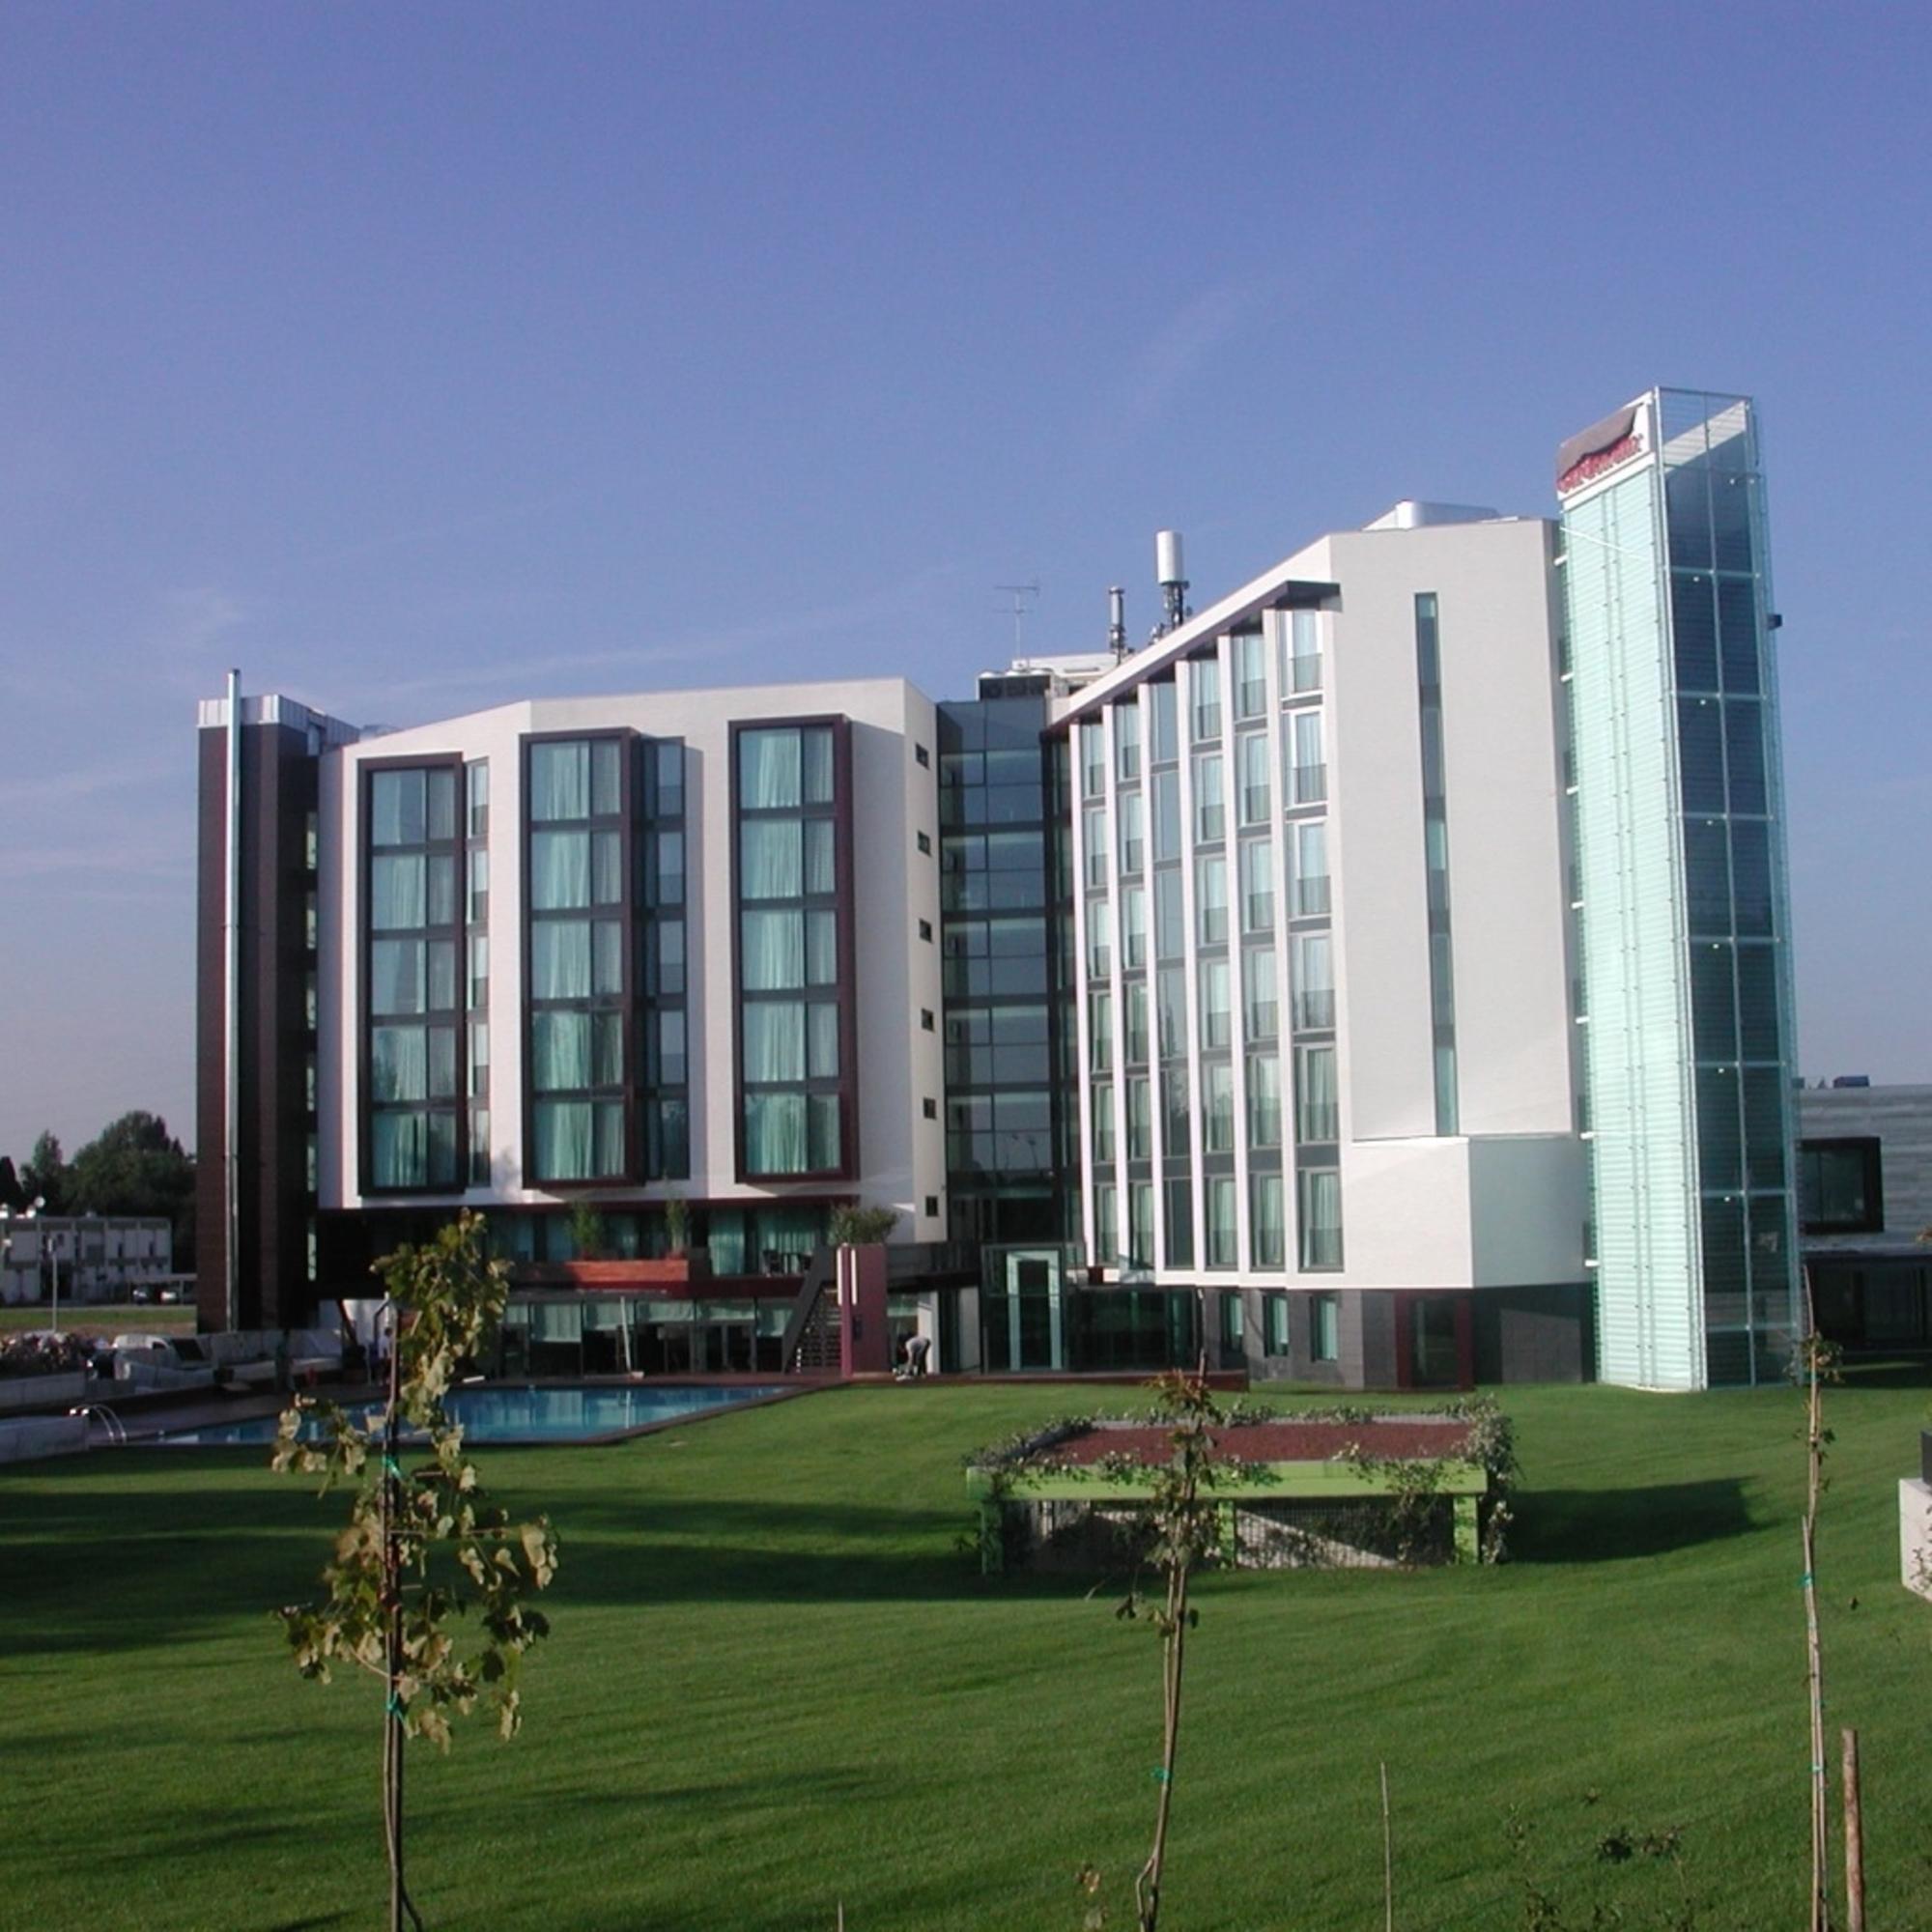 Hilton Garden Inn Venice Edifici Multipiano Referenze Tecnostrutture